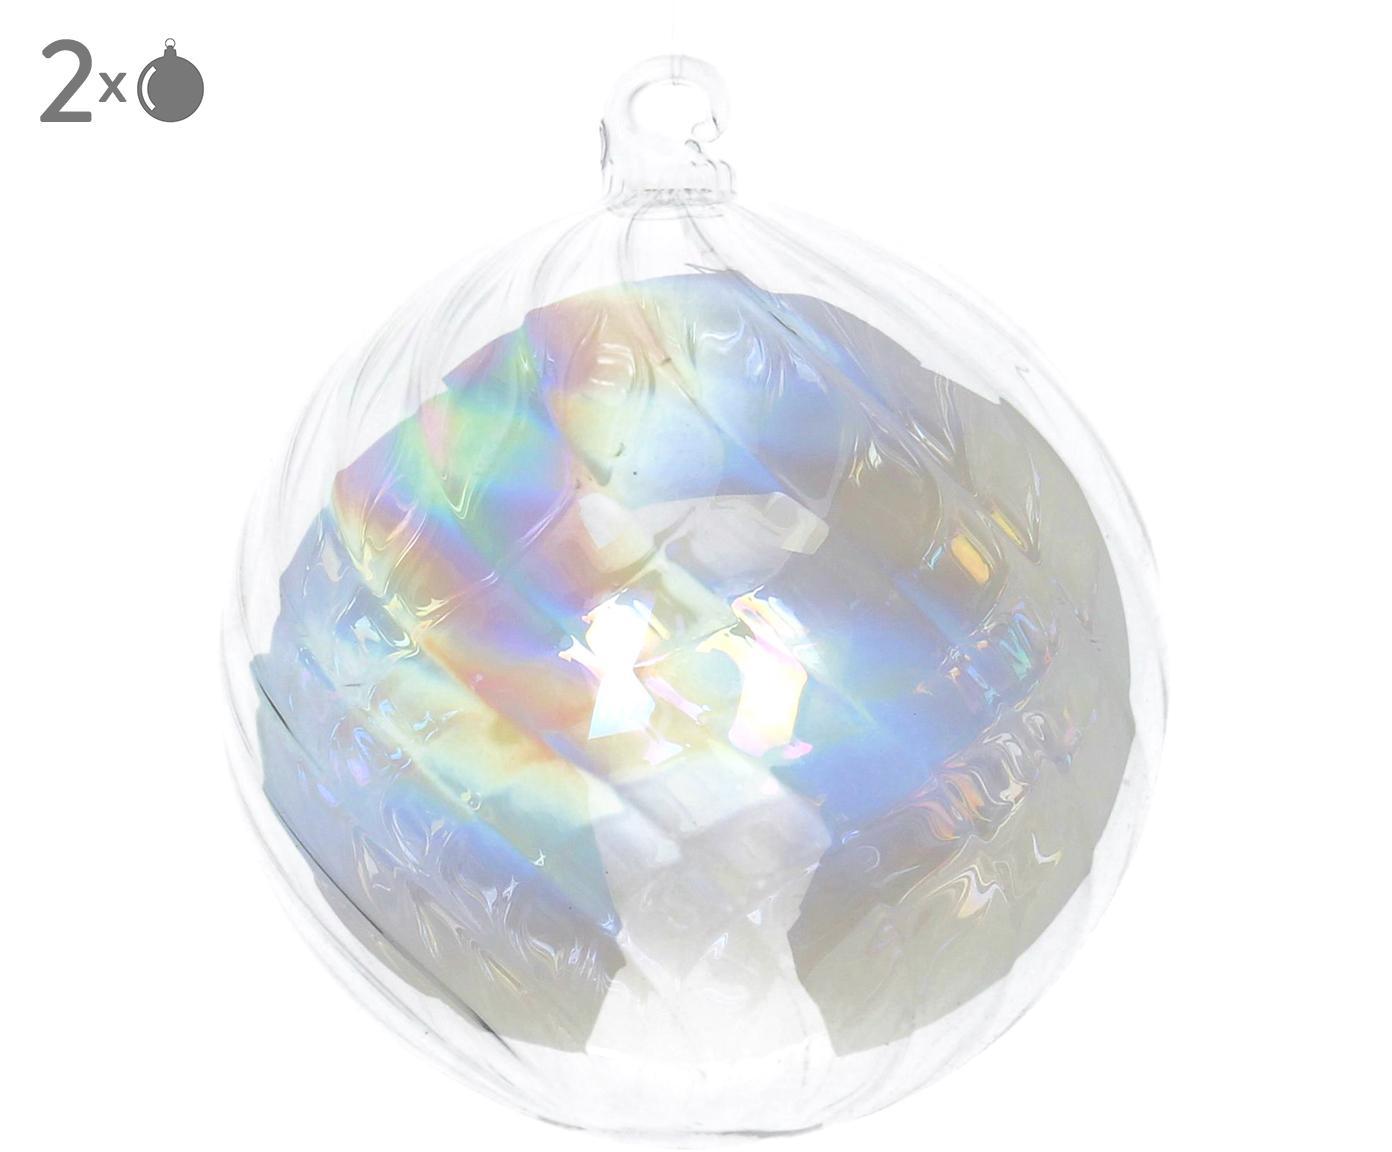 Kerstballen Iridescent, 2 stuks, Transparant, iriserend, Ø 8 cm